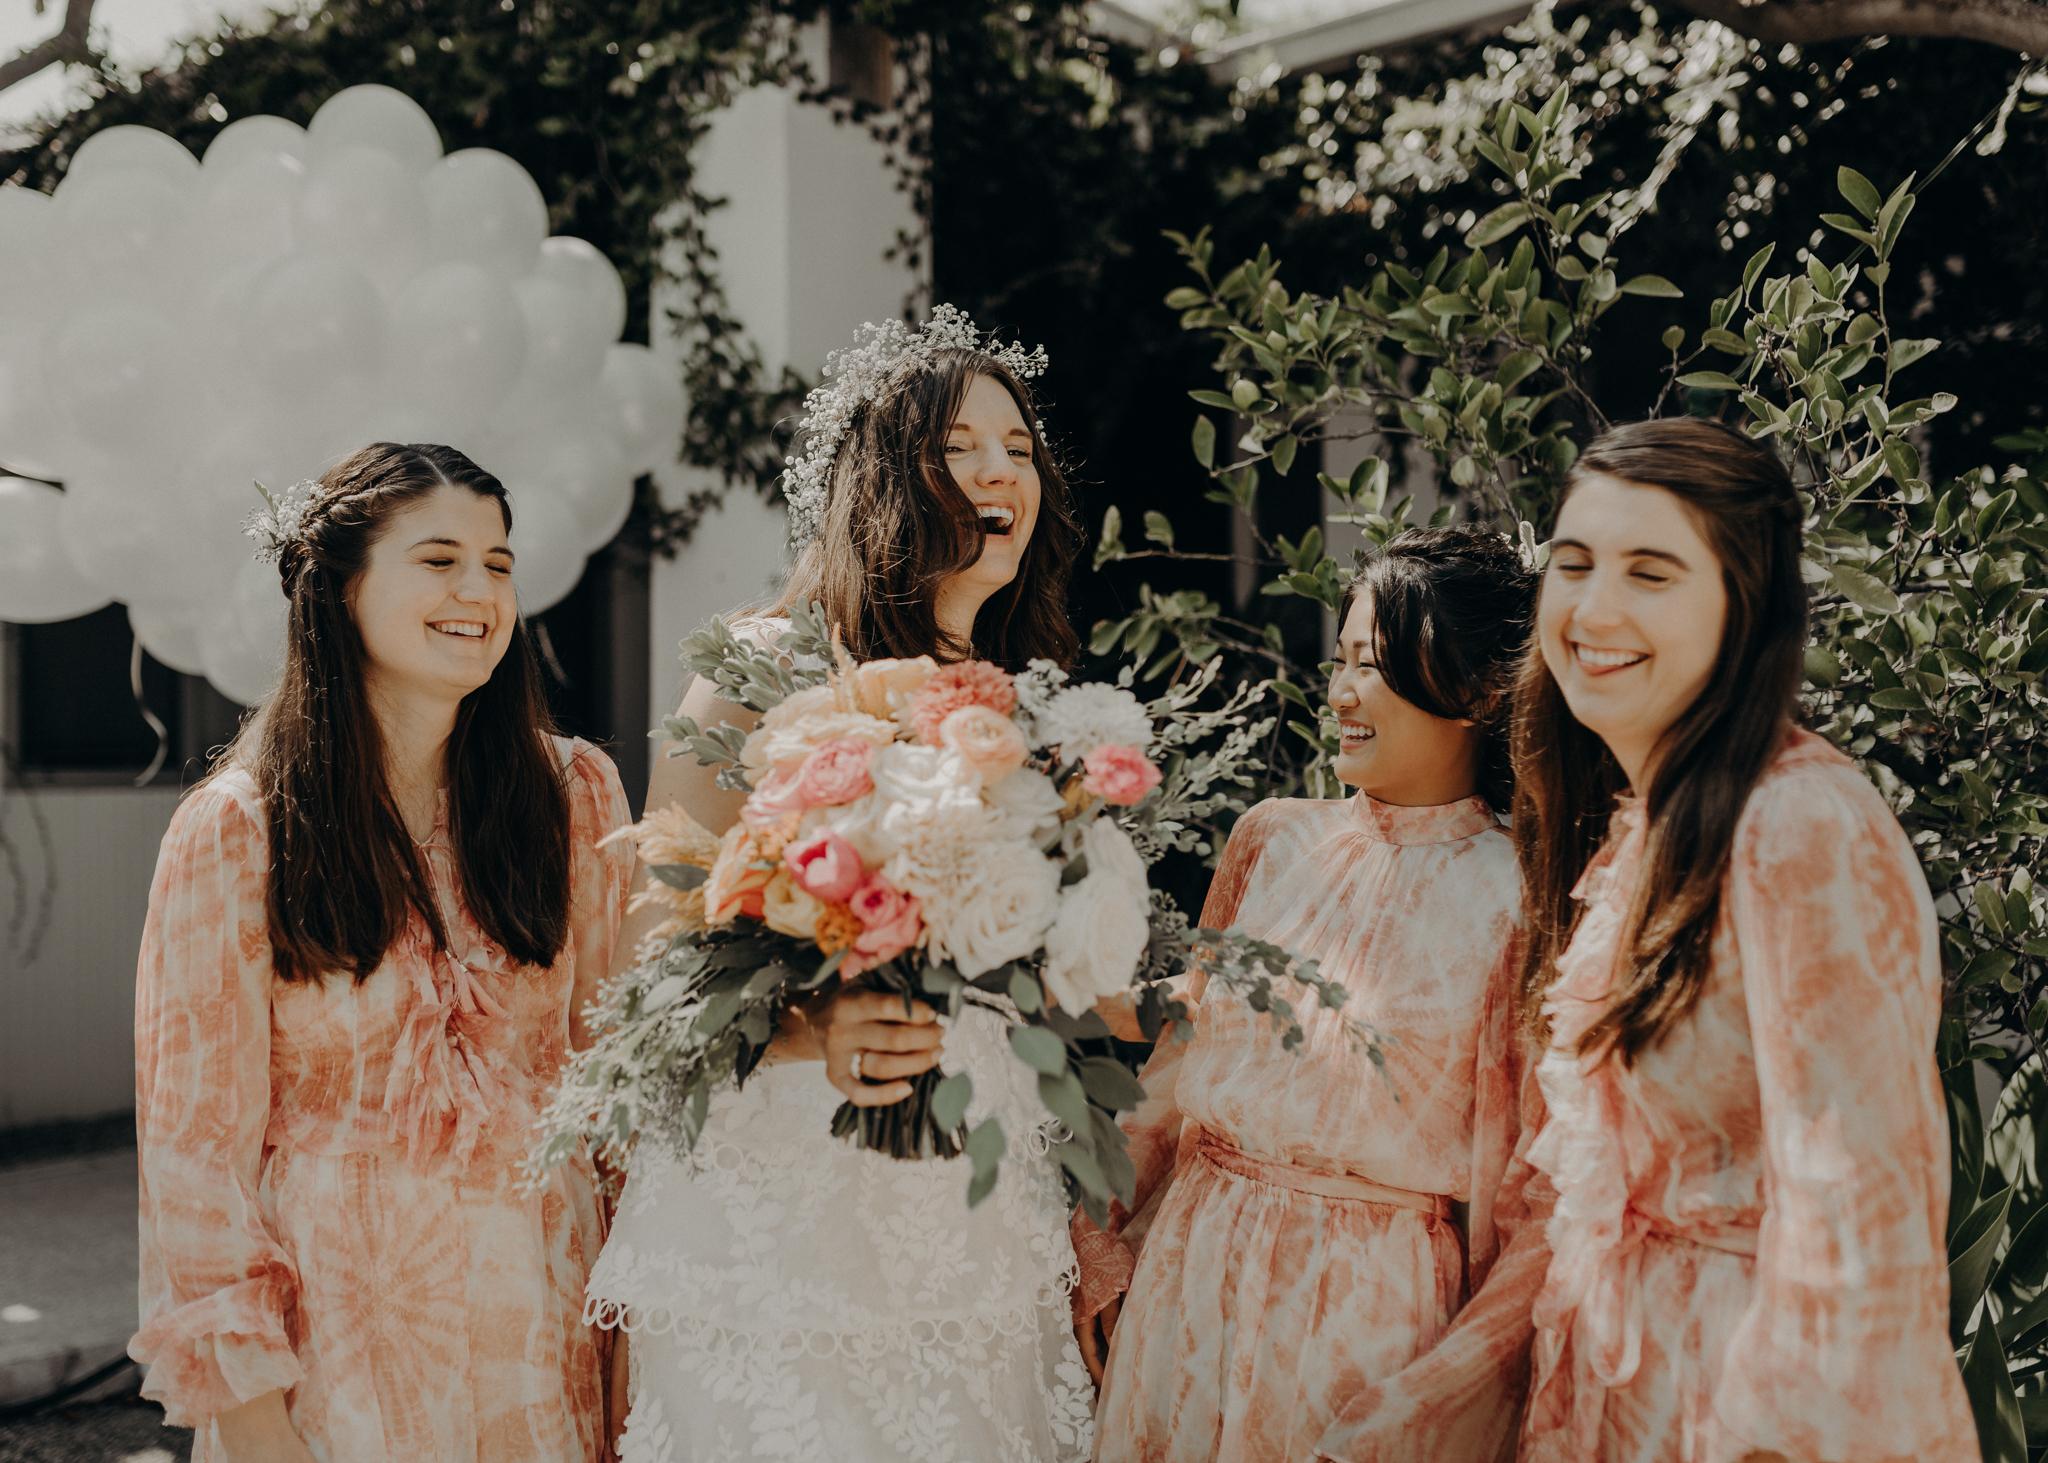 Isaiah + Taylor Photography - Private Estate Backyard Wedding - Beverly Hills - Los Angeles Wedding Photographer - 47.jpg